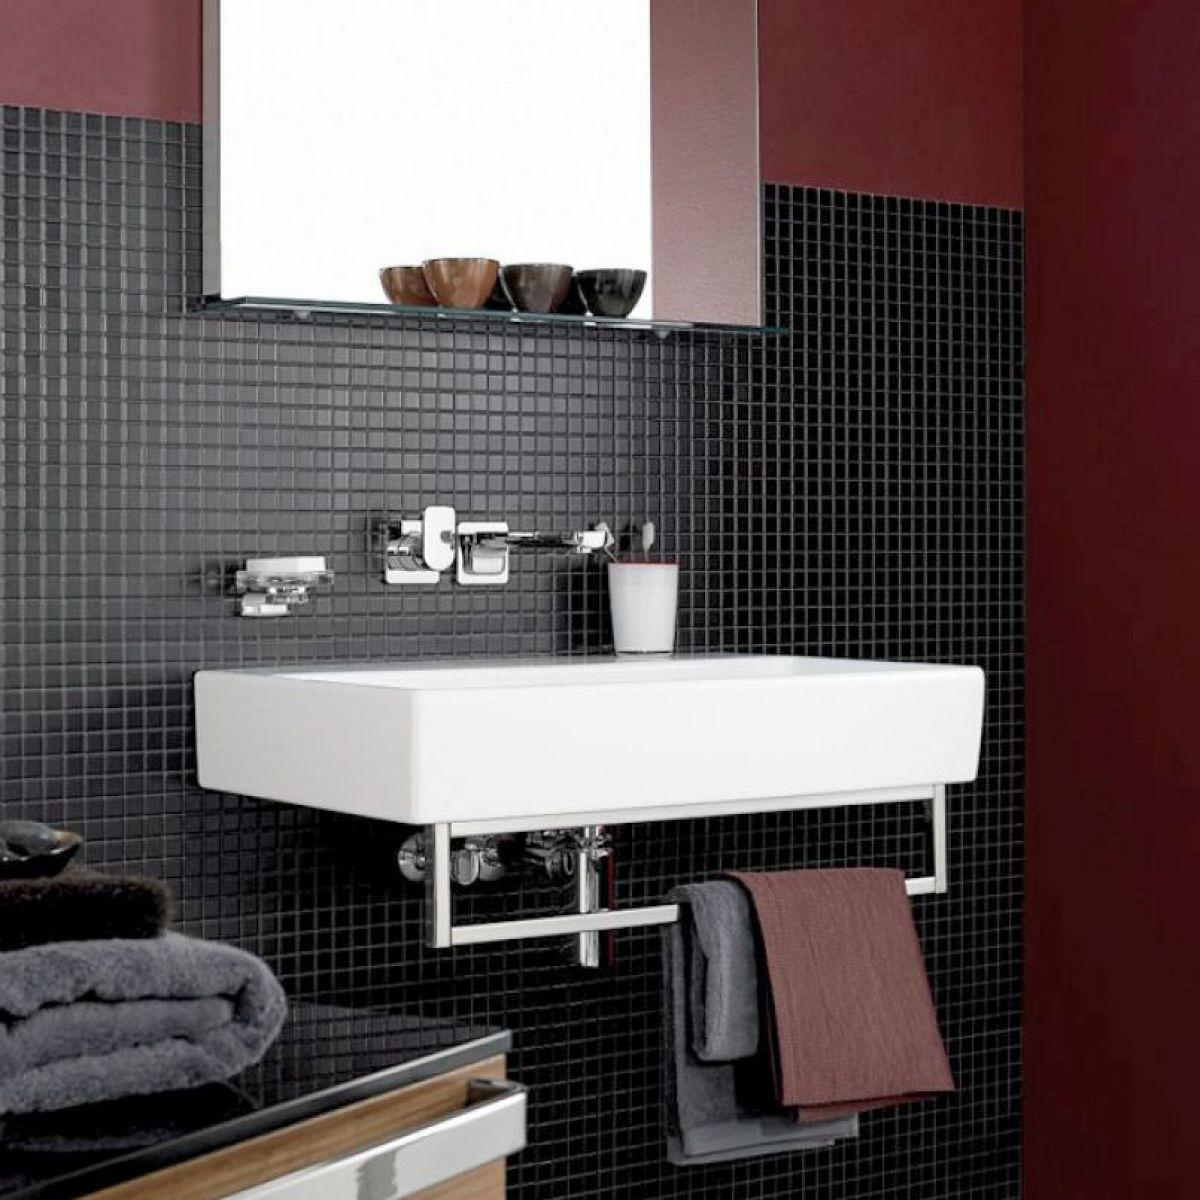 Villeroy & Boch 600mm Memento Washbasin : UK Bathrooms